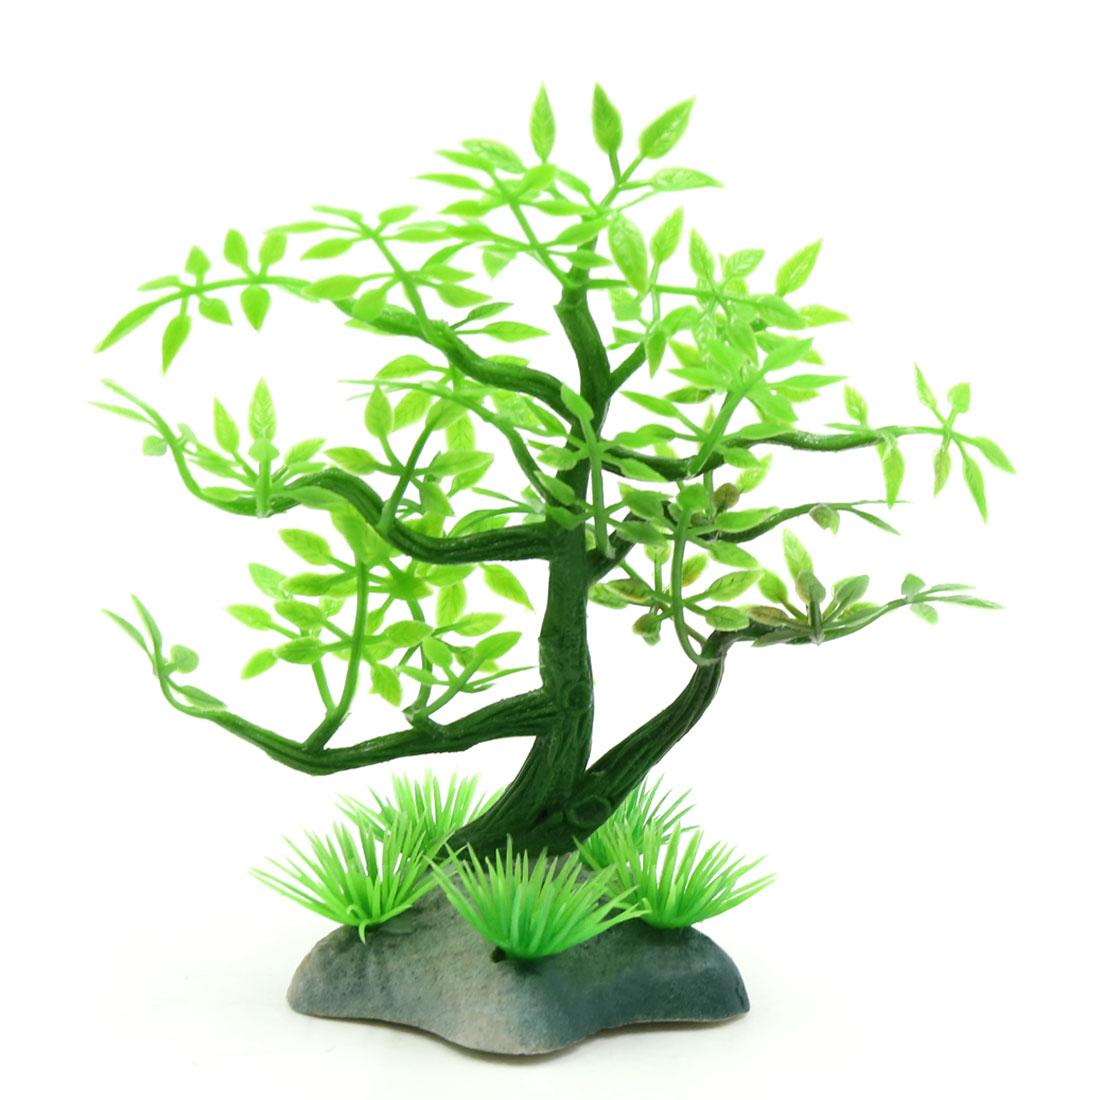 Plastic Mini Lifelike Tree Aquarium Fish Tank Fishbowl Landscape Decor w/ Stand